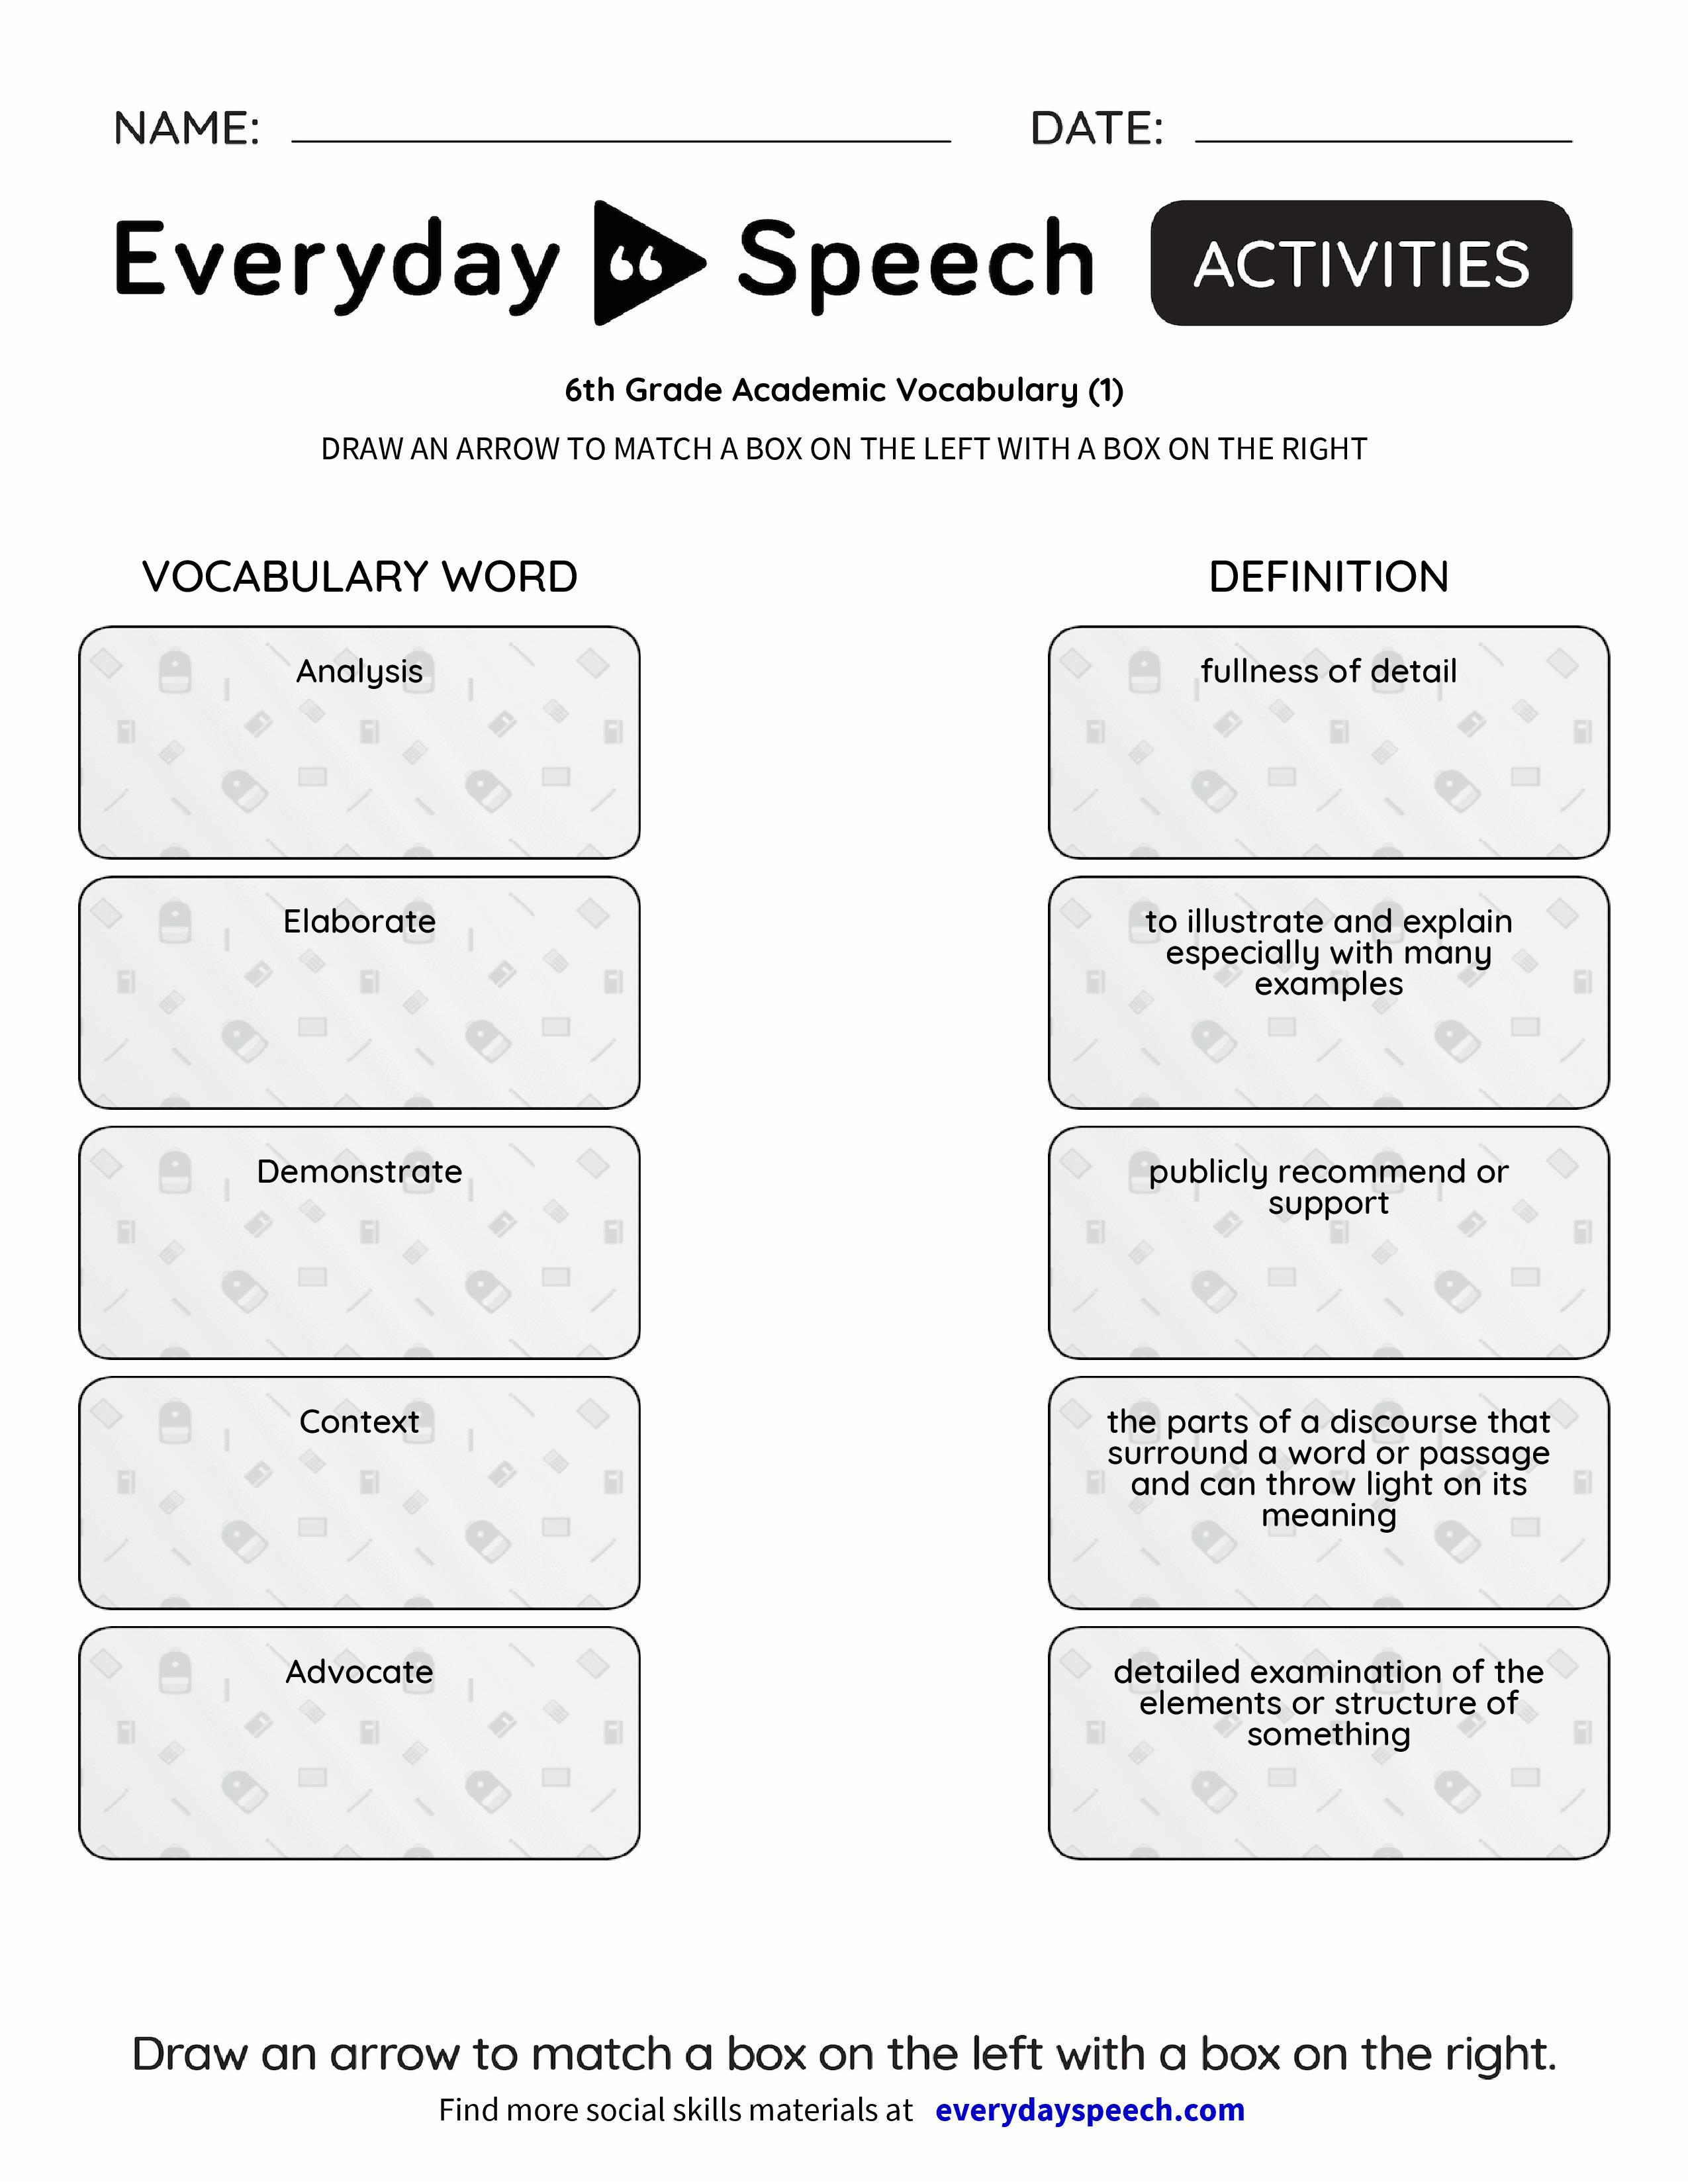 6th Grade Academic Vocabulary (1) - Everyday Speech ...